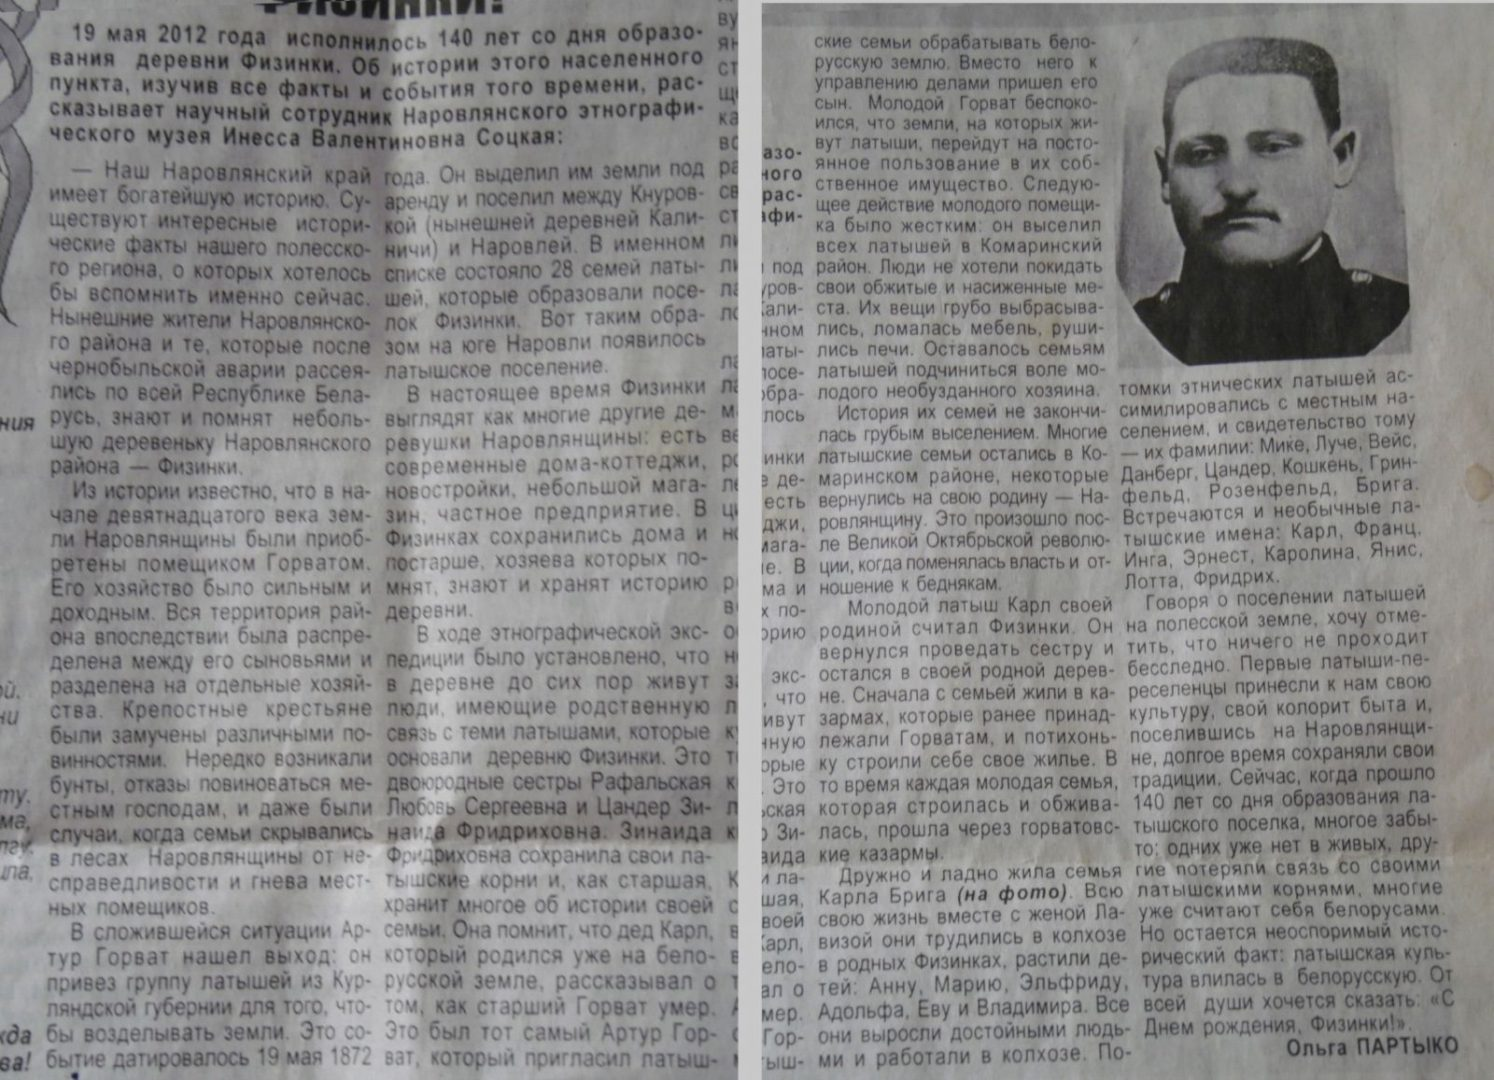 Основание деревни Физинки в газете